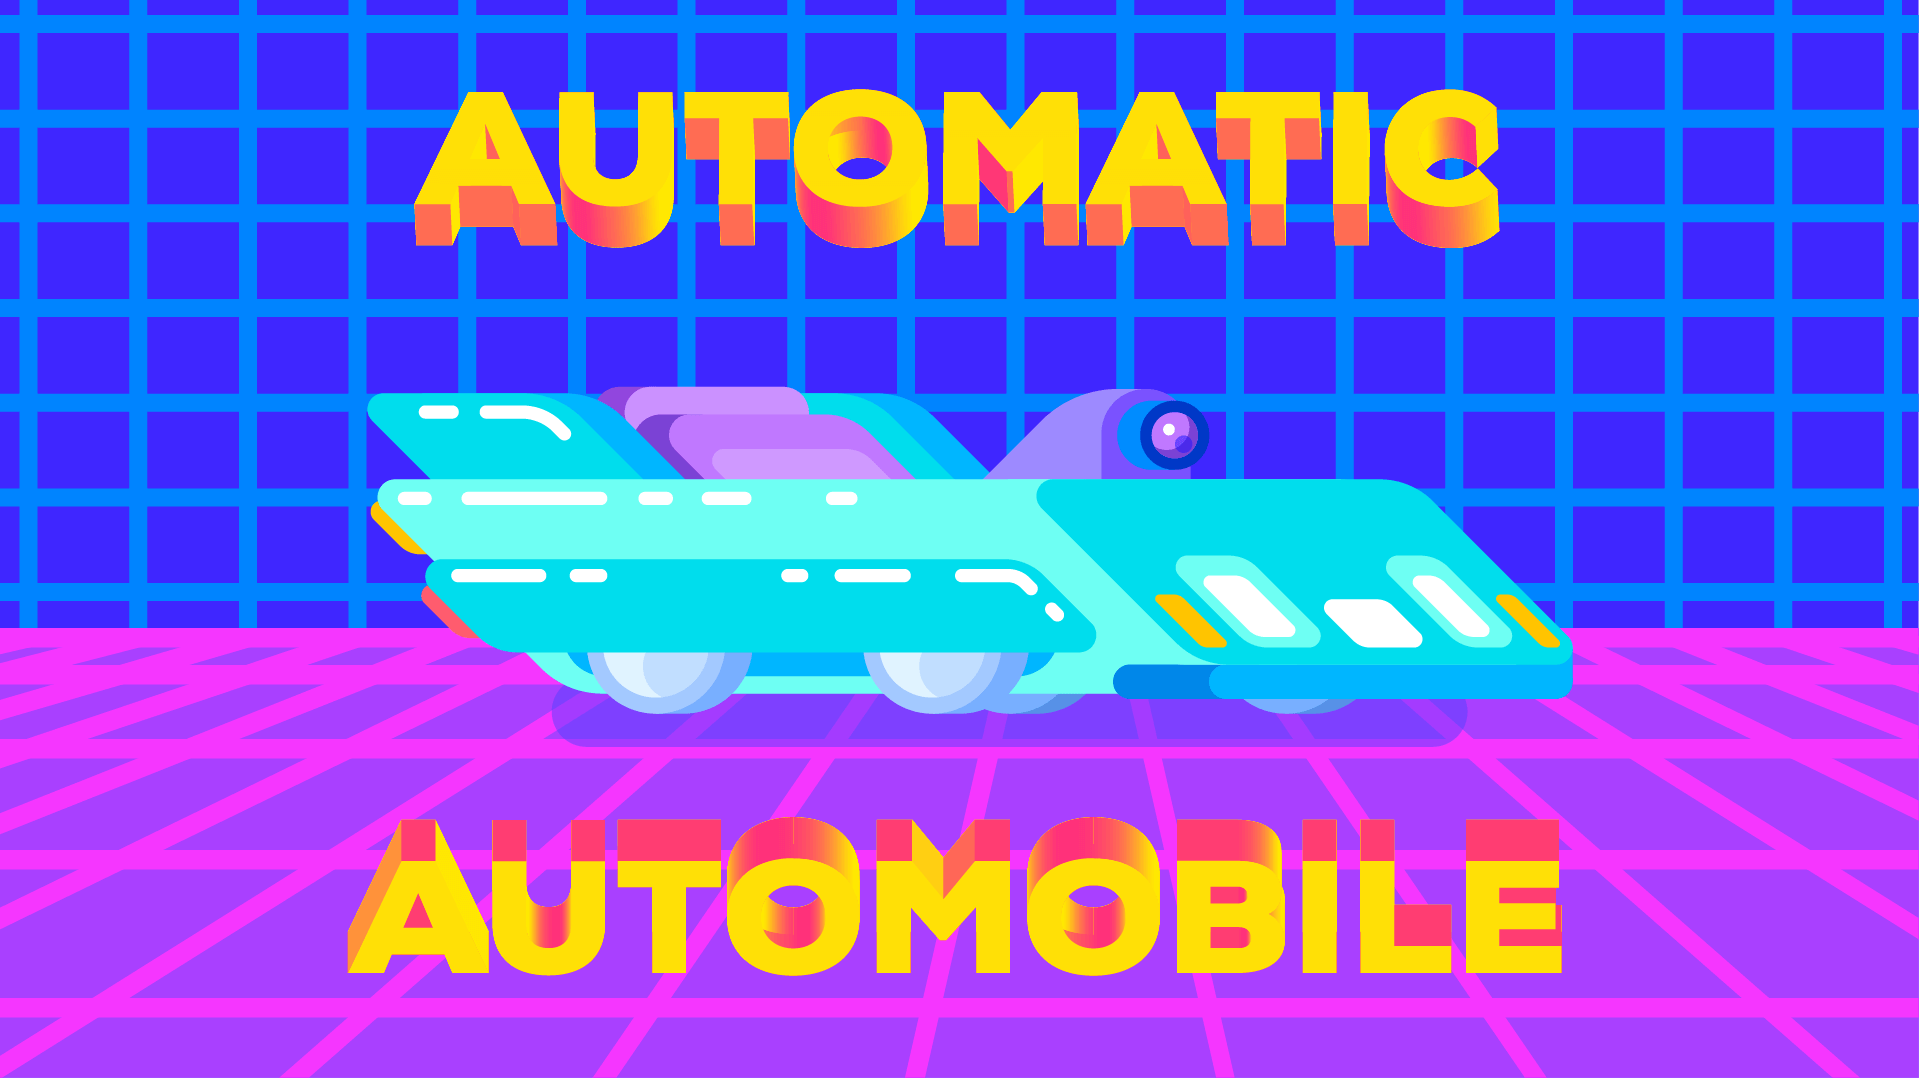 inanutshell-kurzgesagt-Automation-03